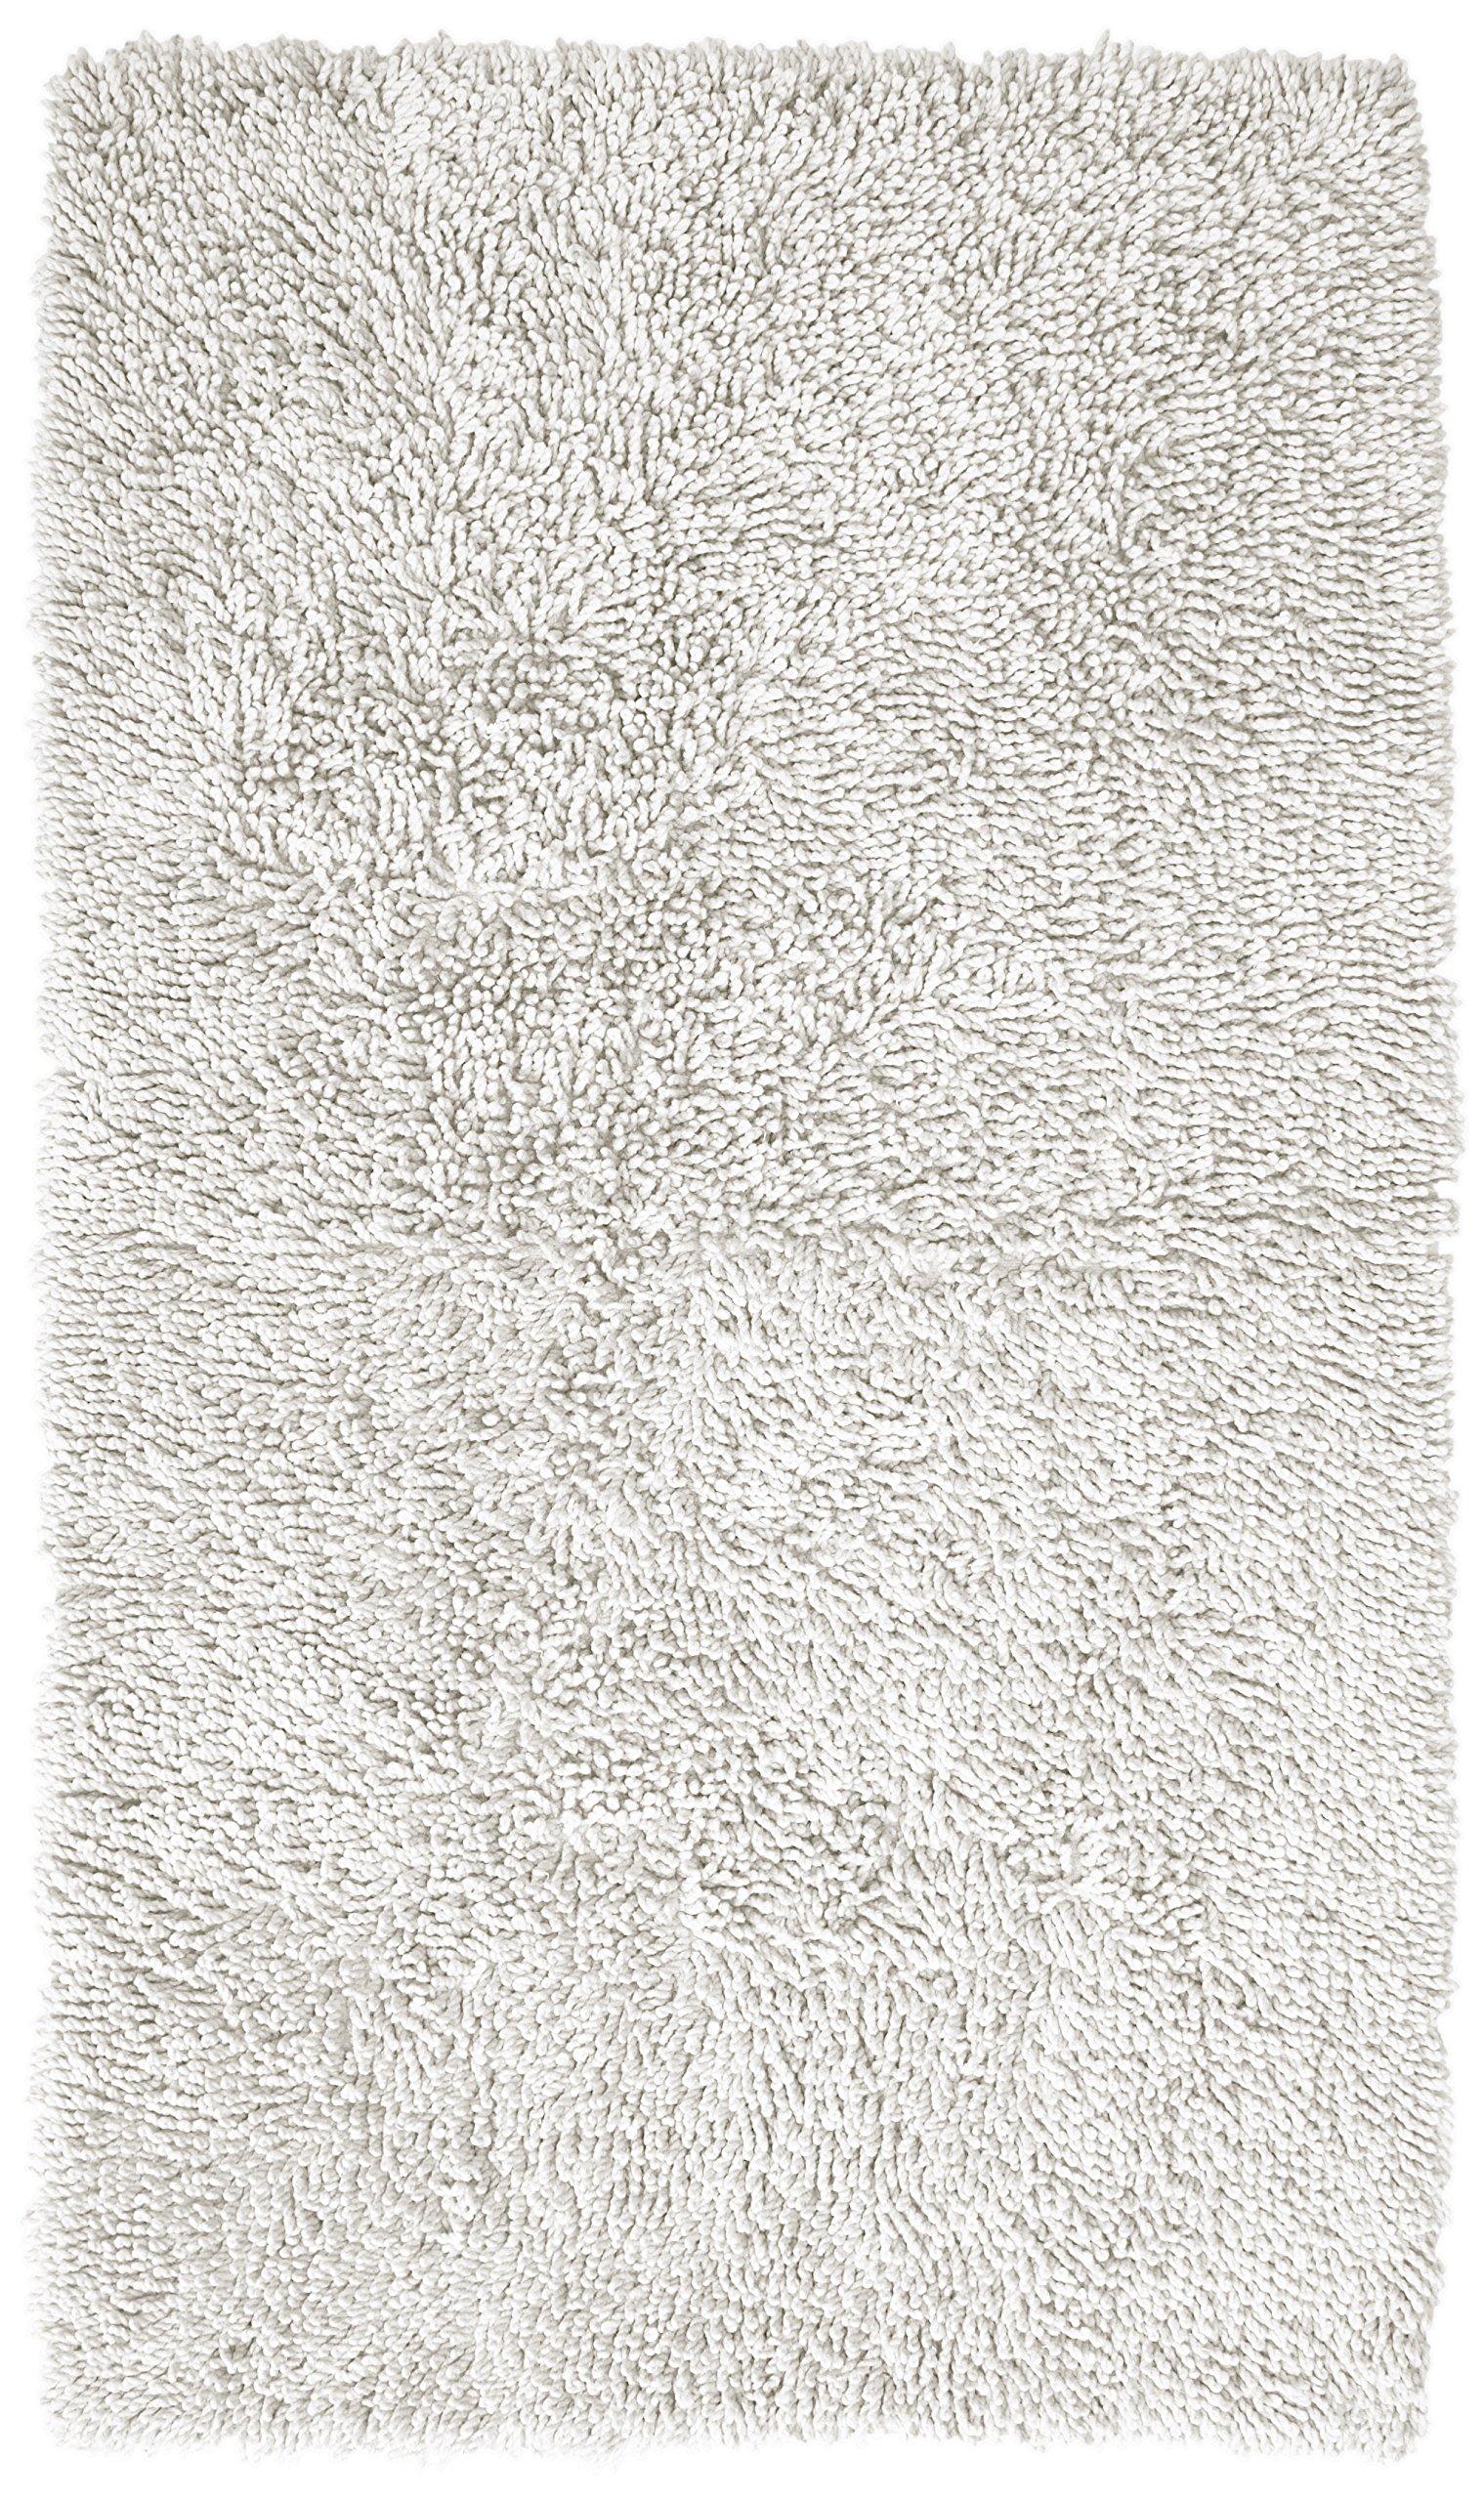 Pinzon 100% Cotton Looped Bath Rug with Non-Slip Backing - 21 x 34 inch, White